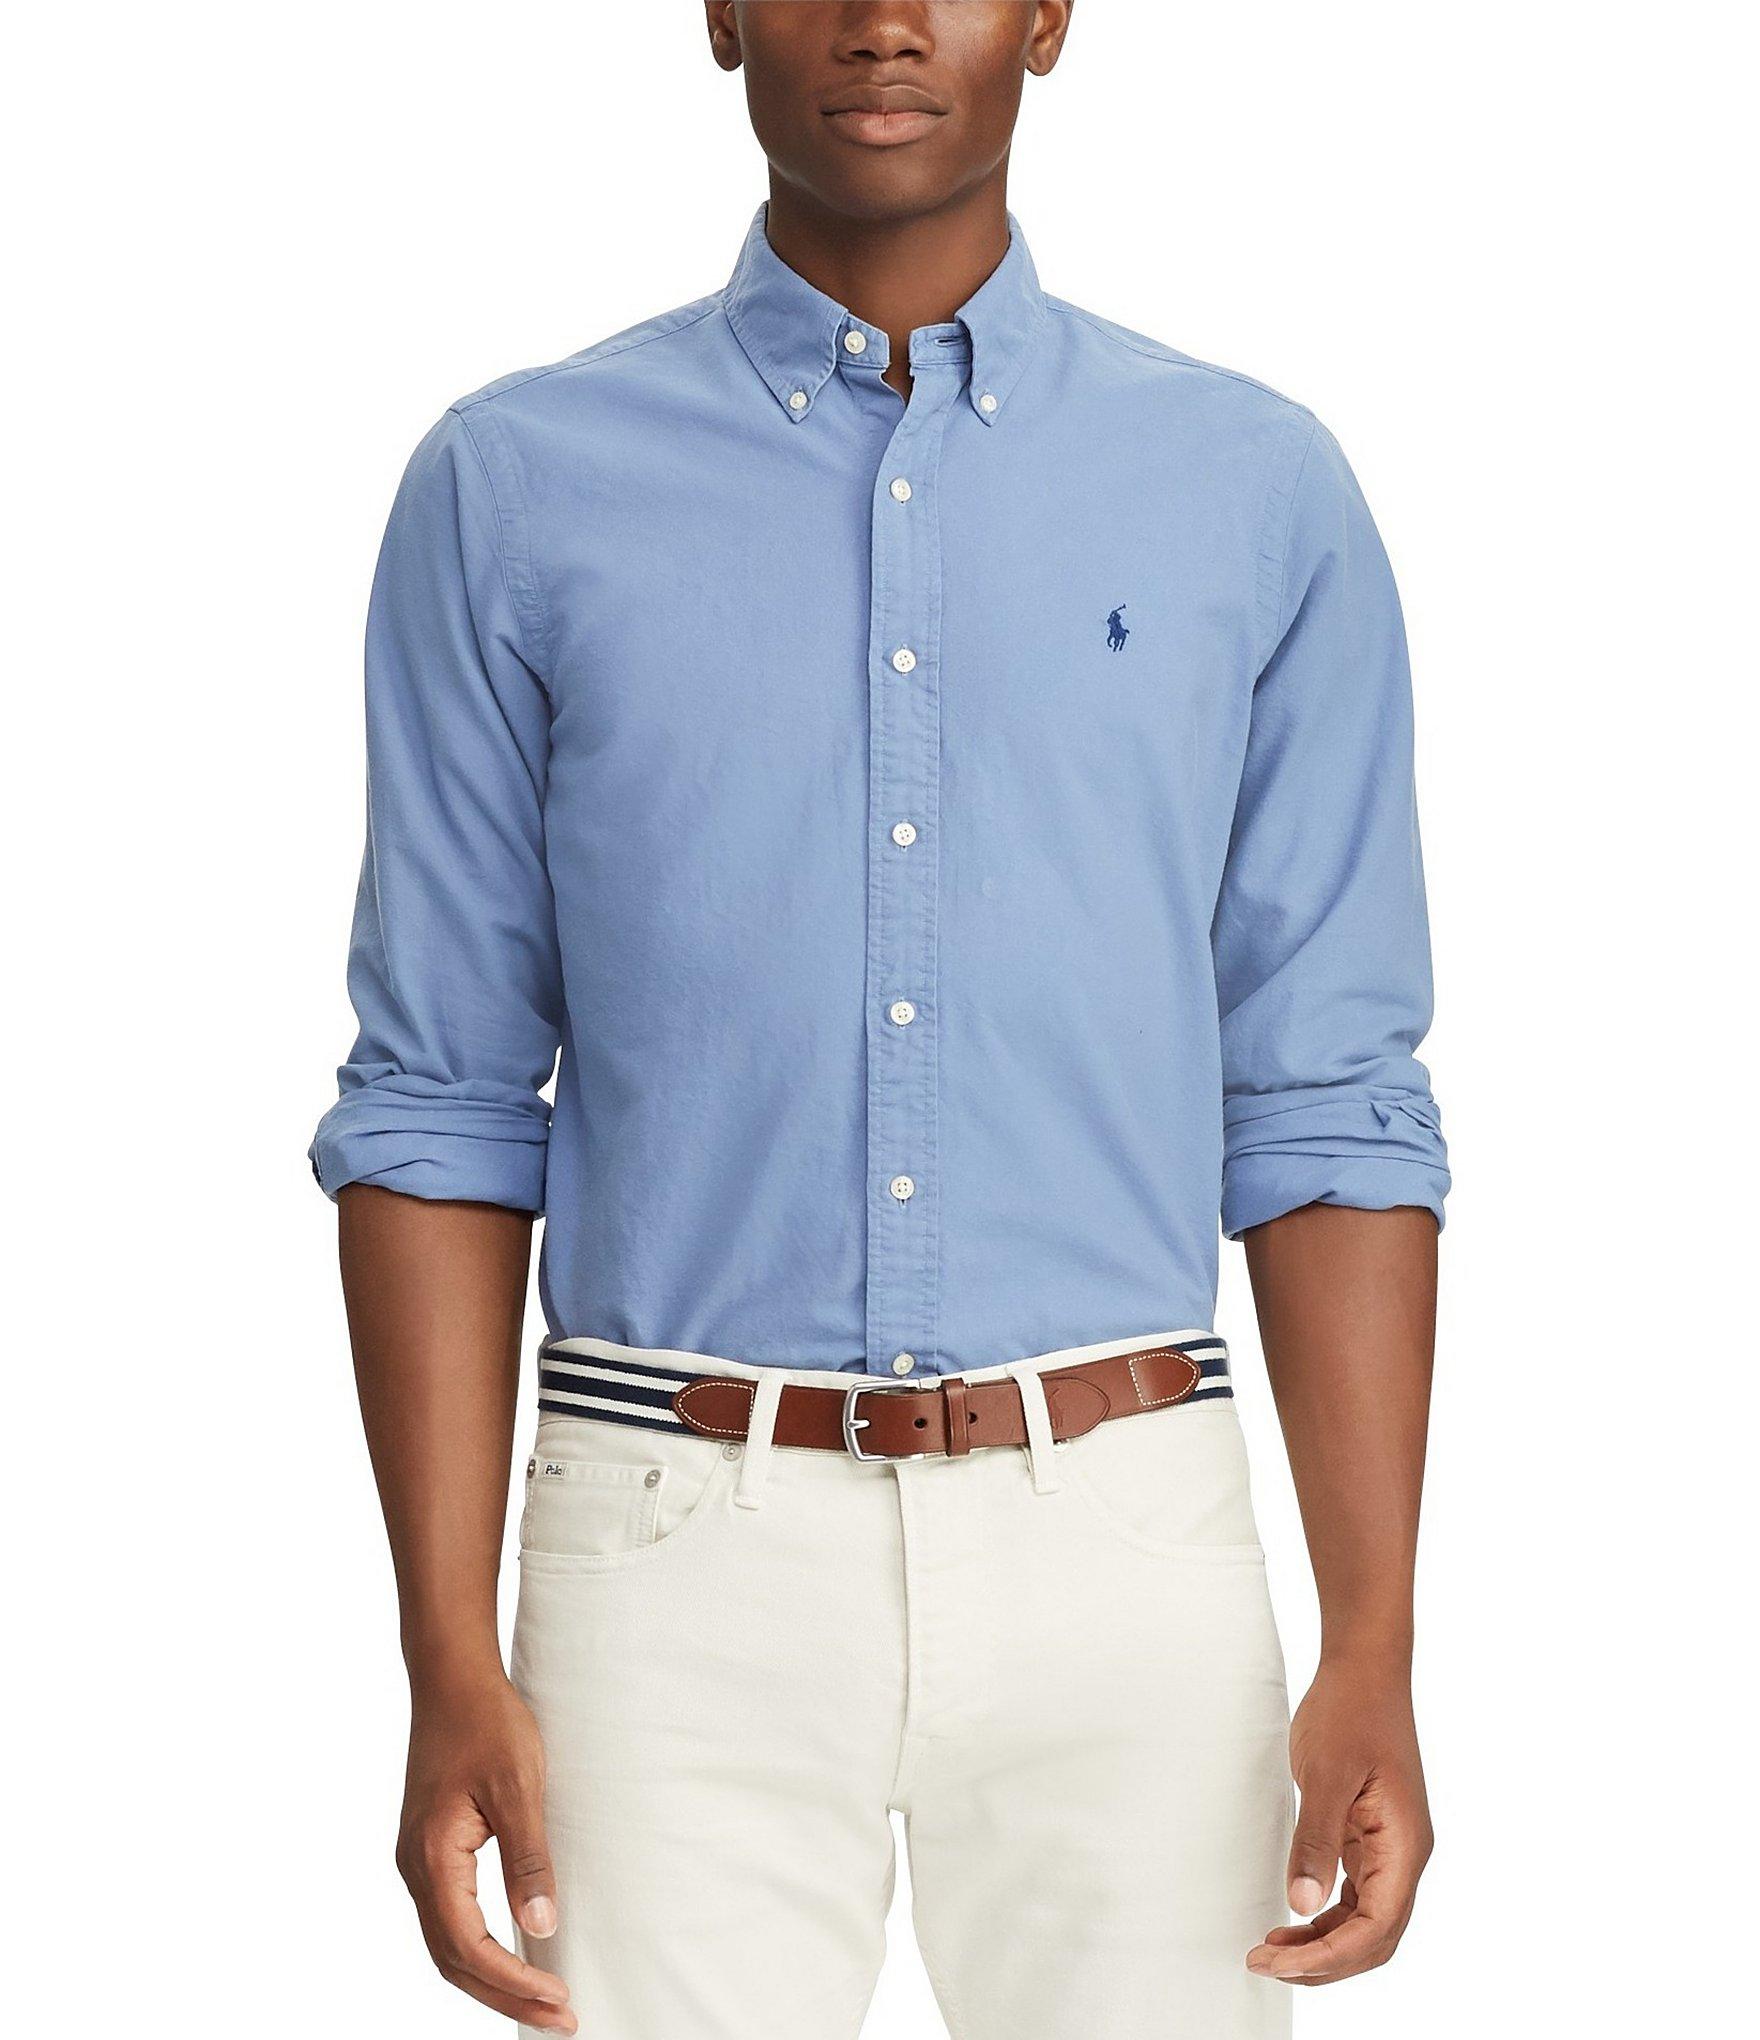 baa2a786 Polo Ralph LaurenBig & Tall Solid Garment-Dye Oxford Long-Sleeve Woven Shirt